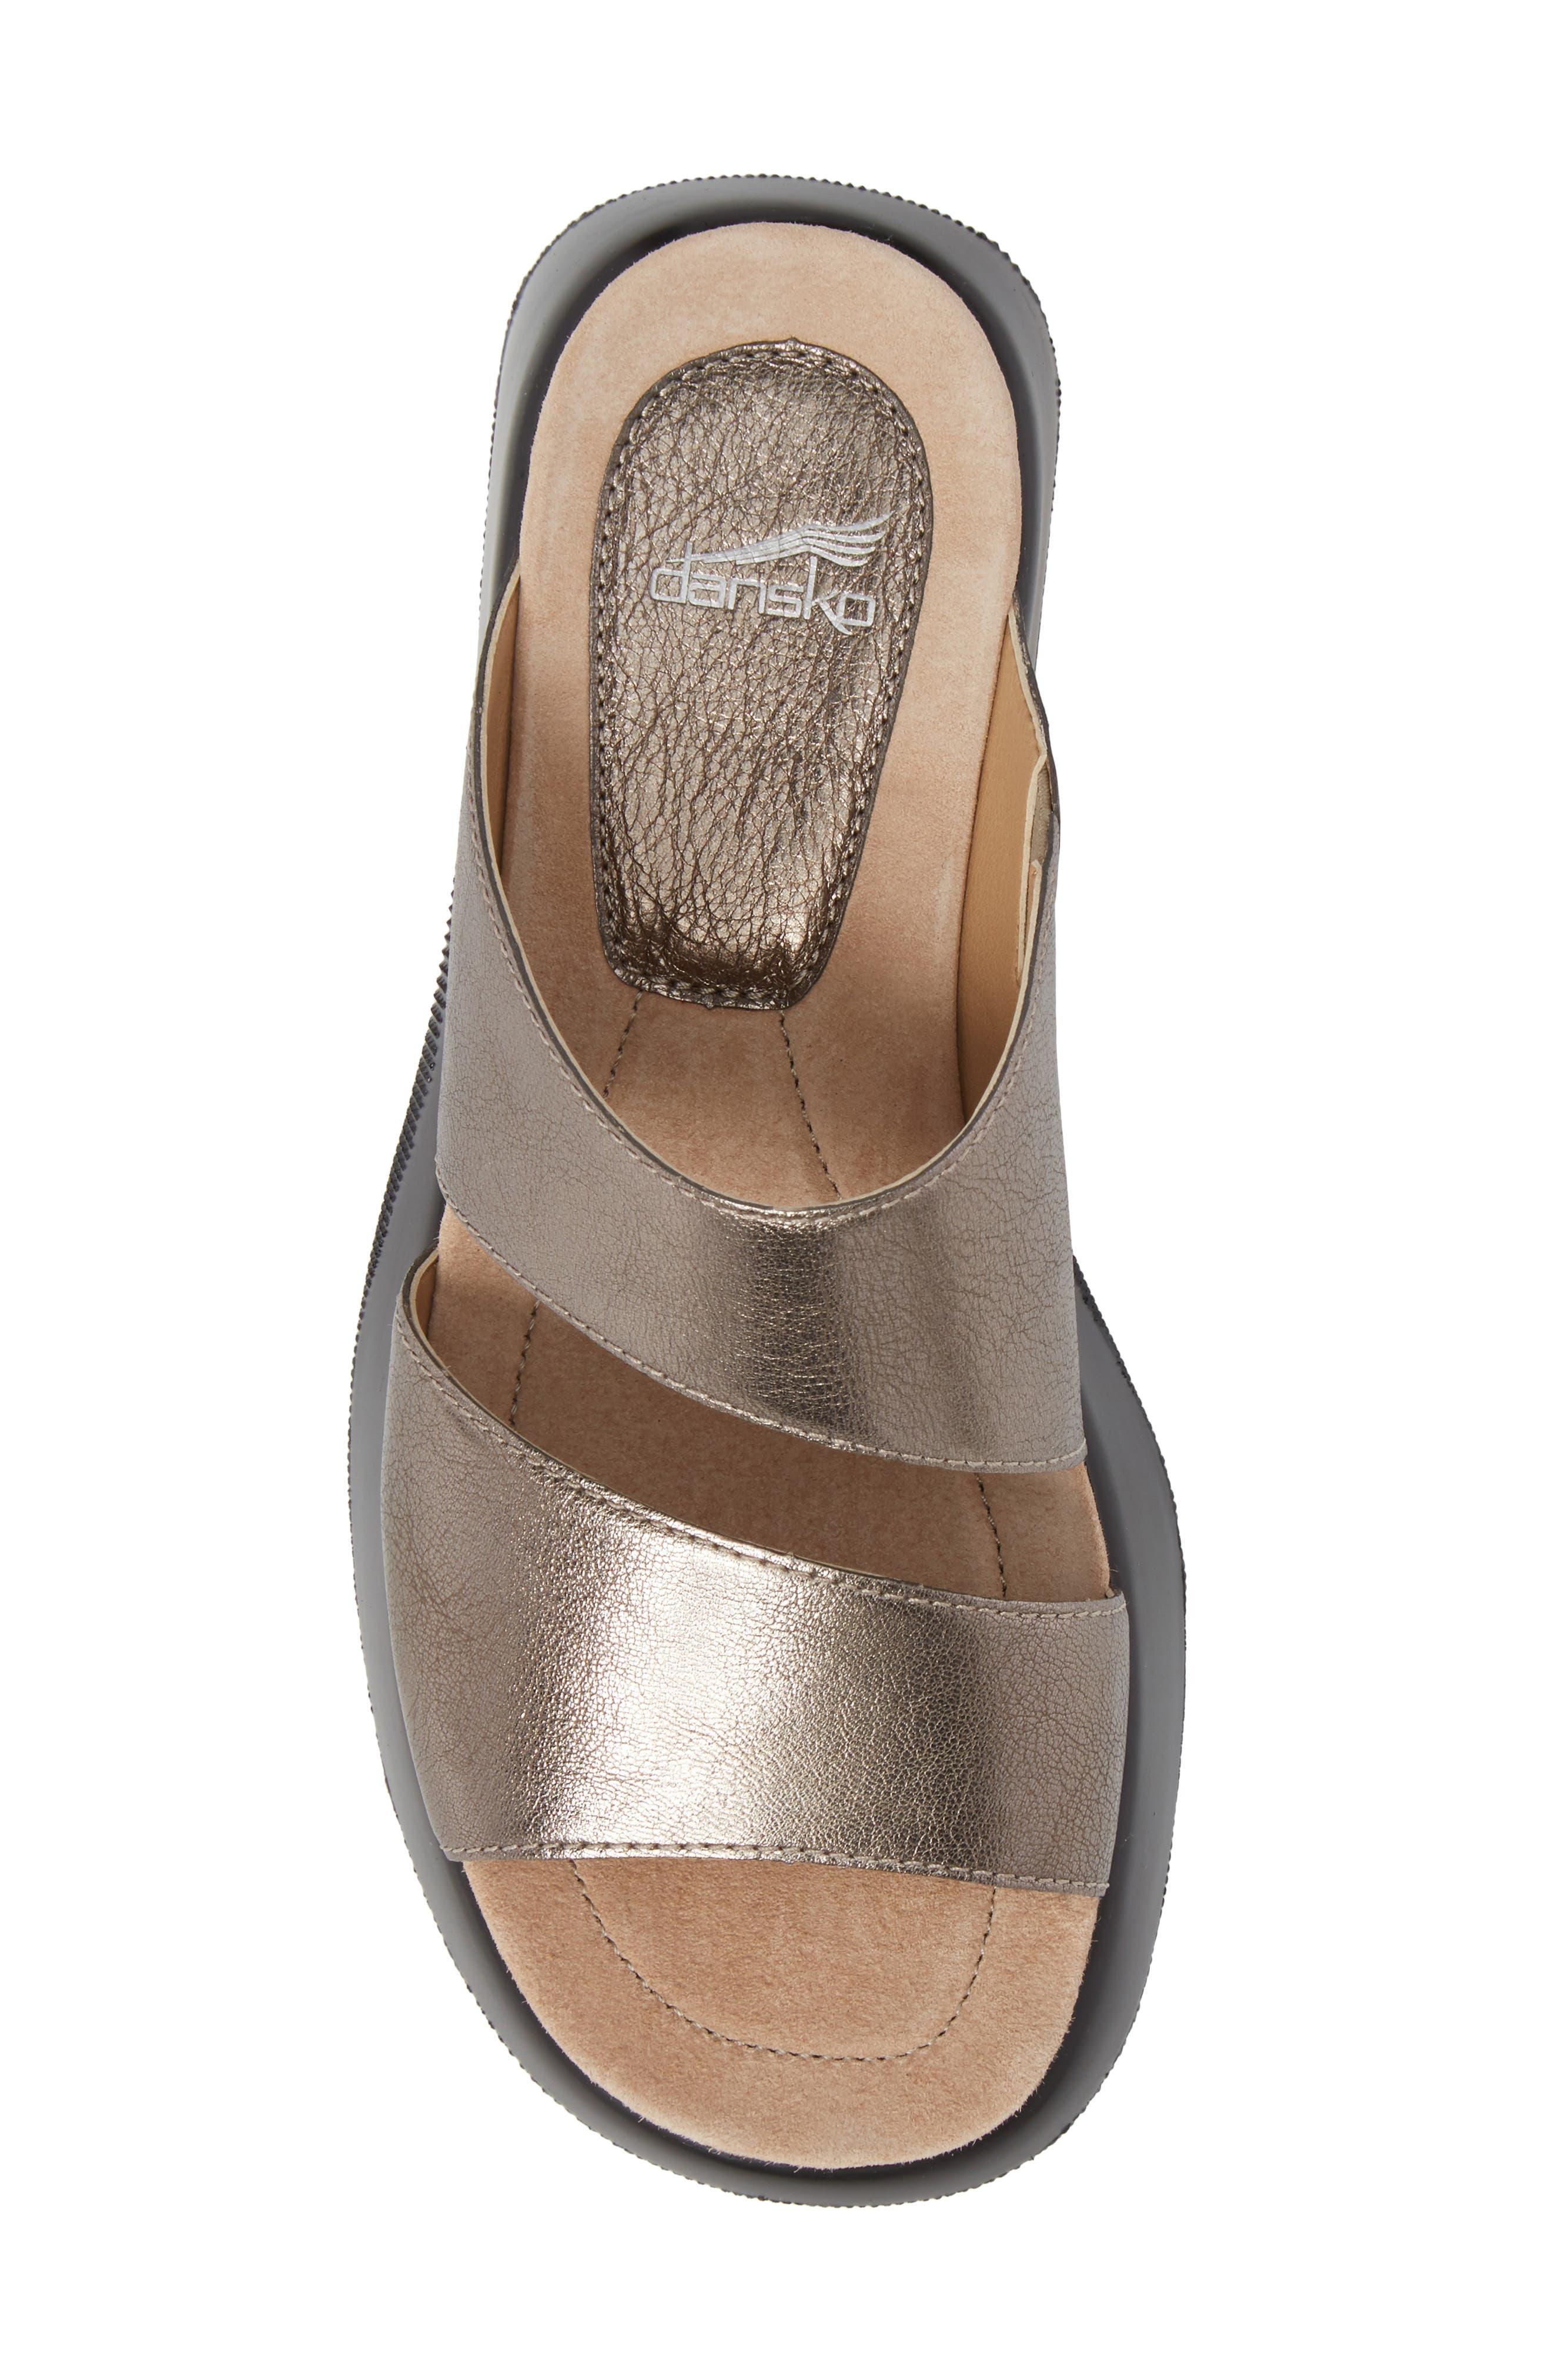 Lana Slide Sandal,                             Alternate thumbnail 5, color,                             Pewter Leather